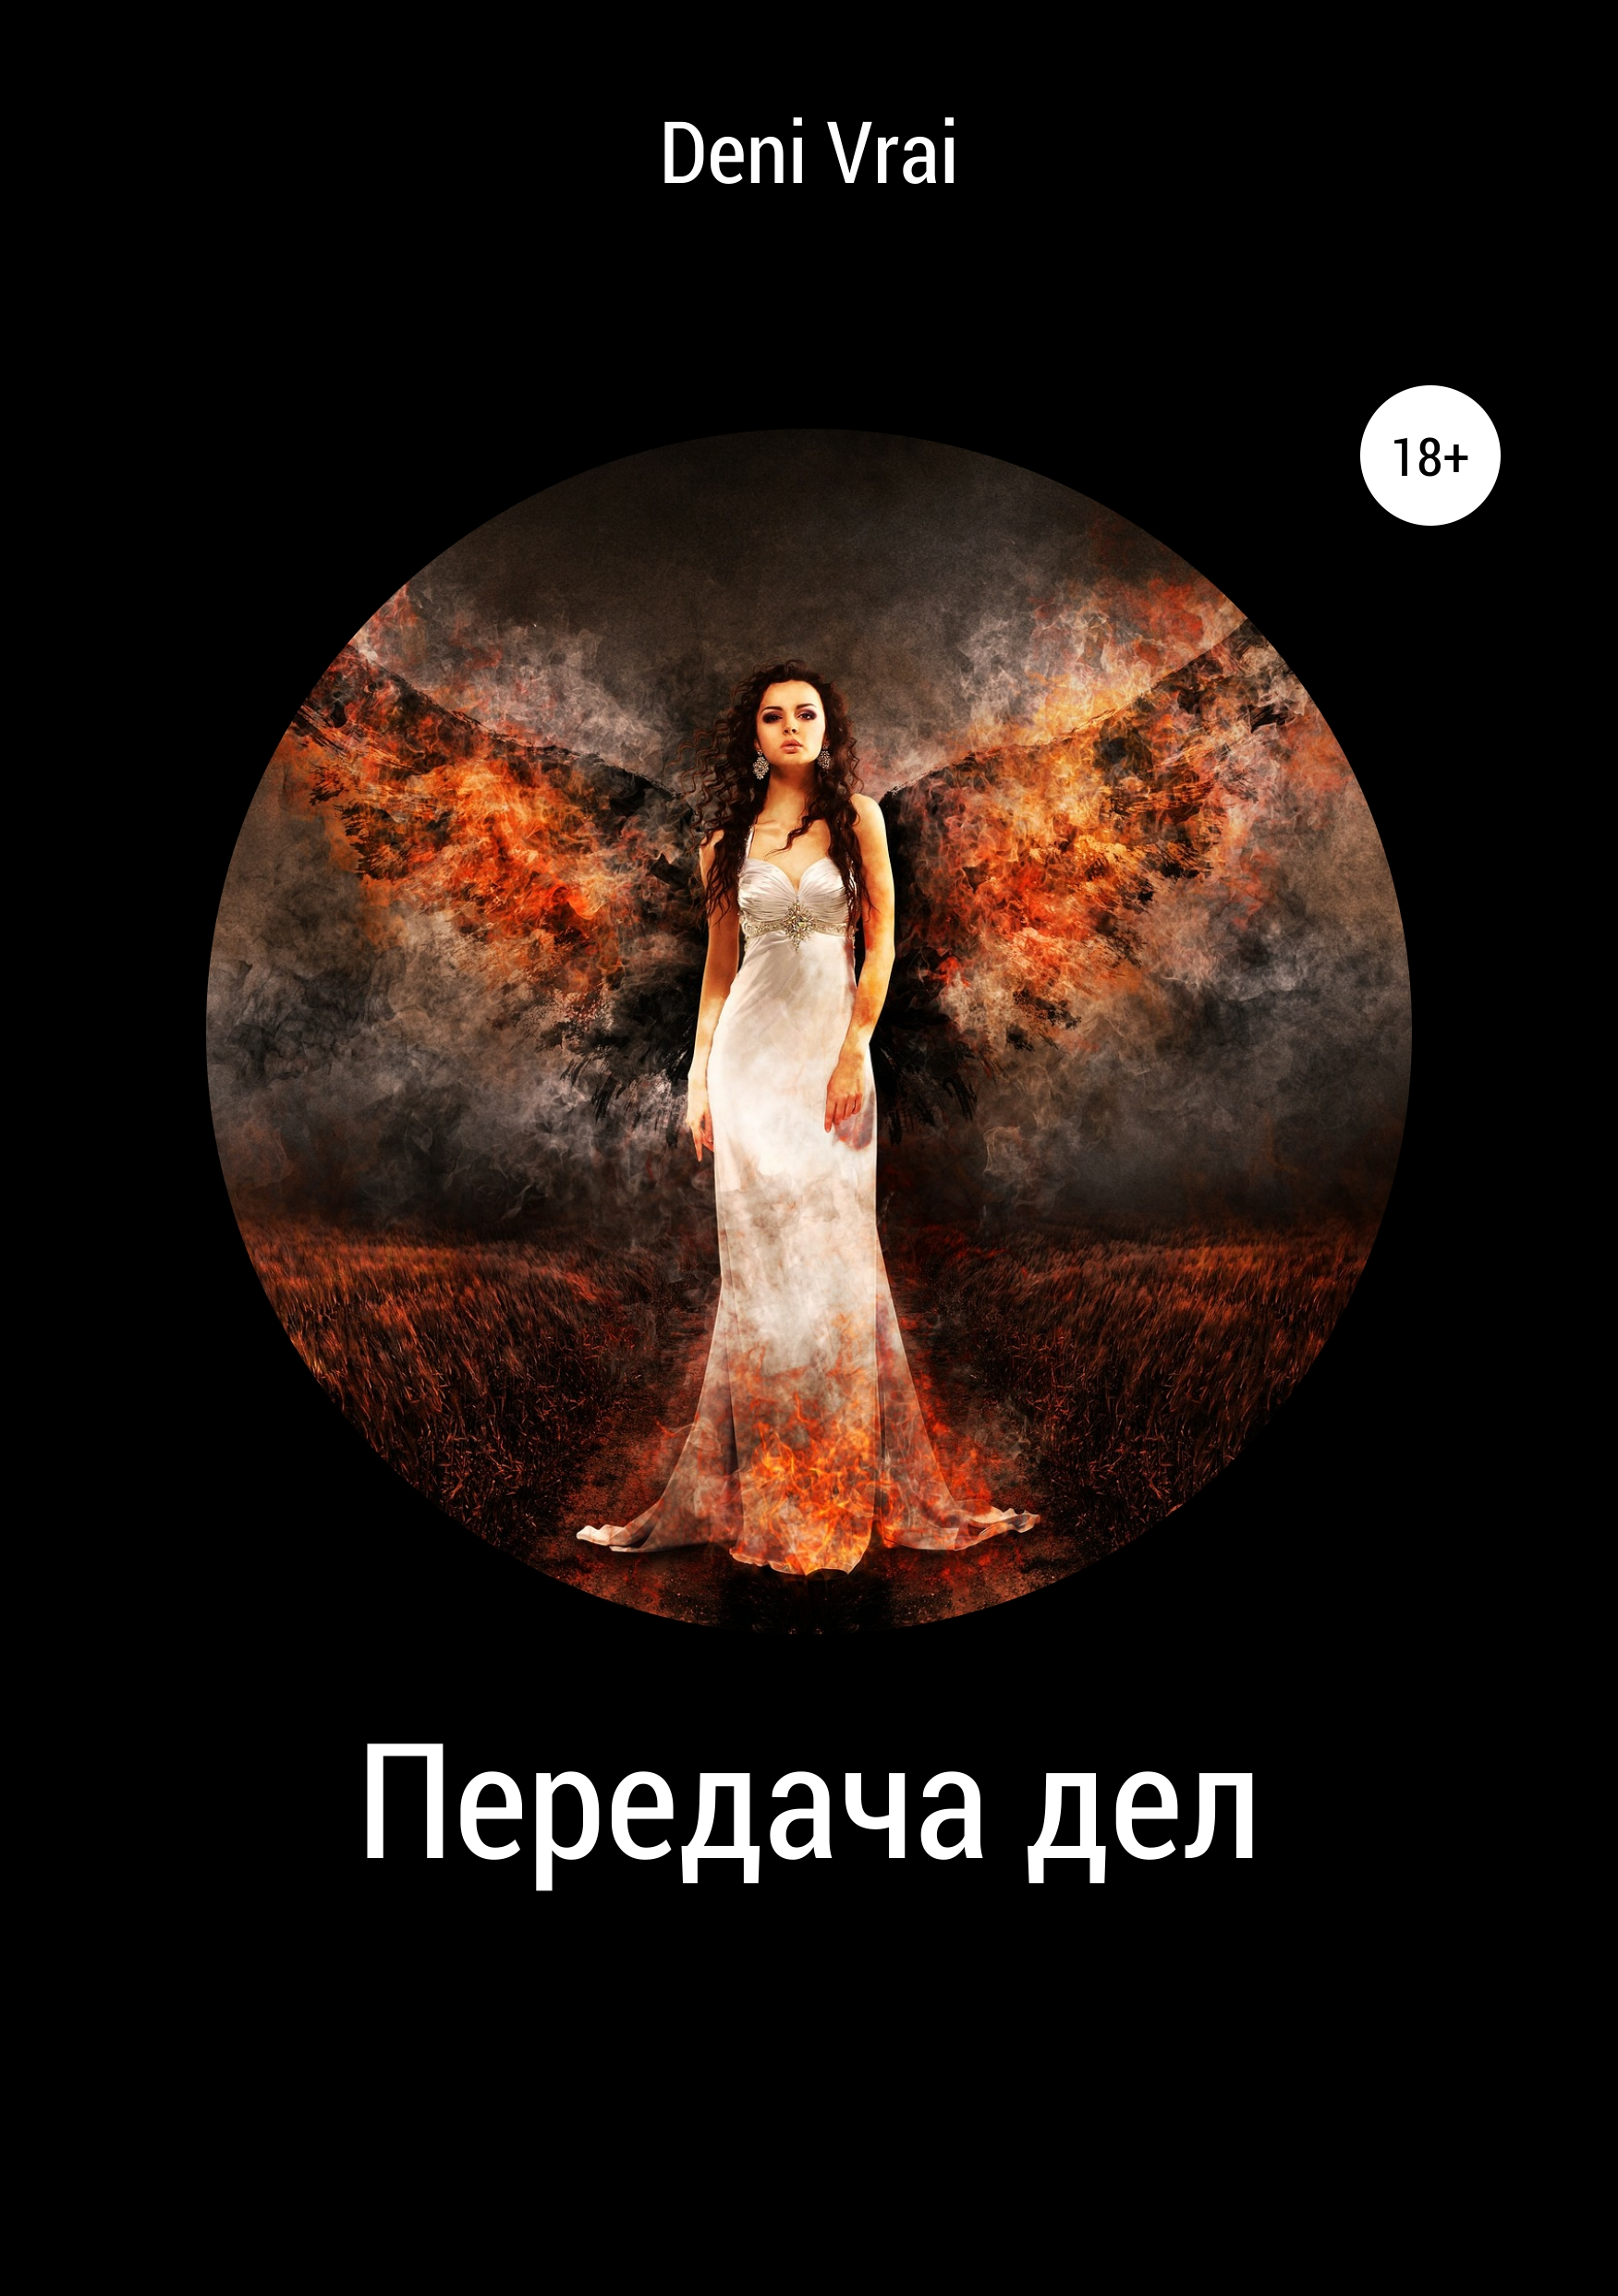 купить Deni Vrai Передача дел по цене 9.99 рублей